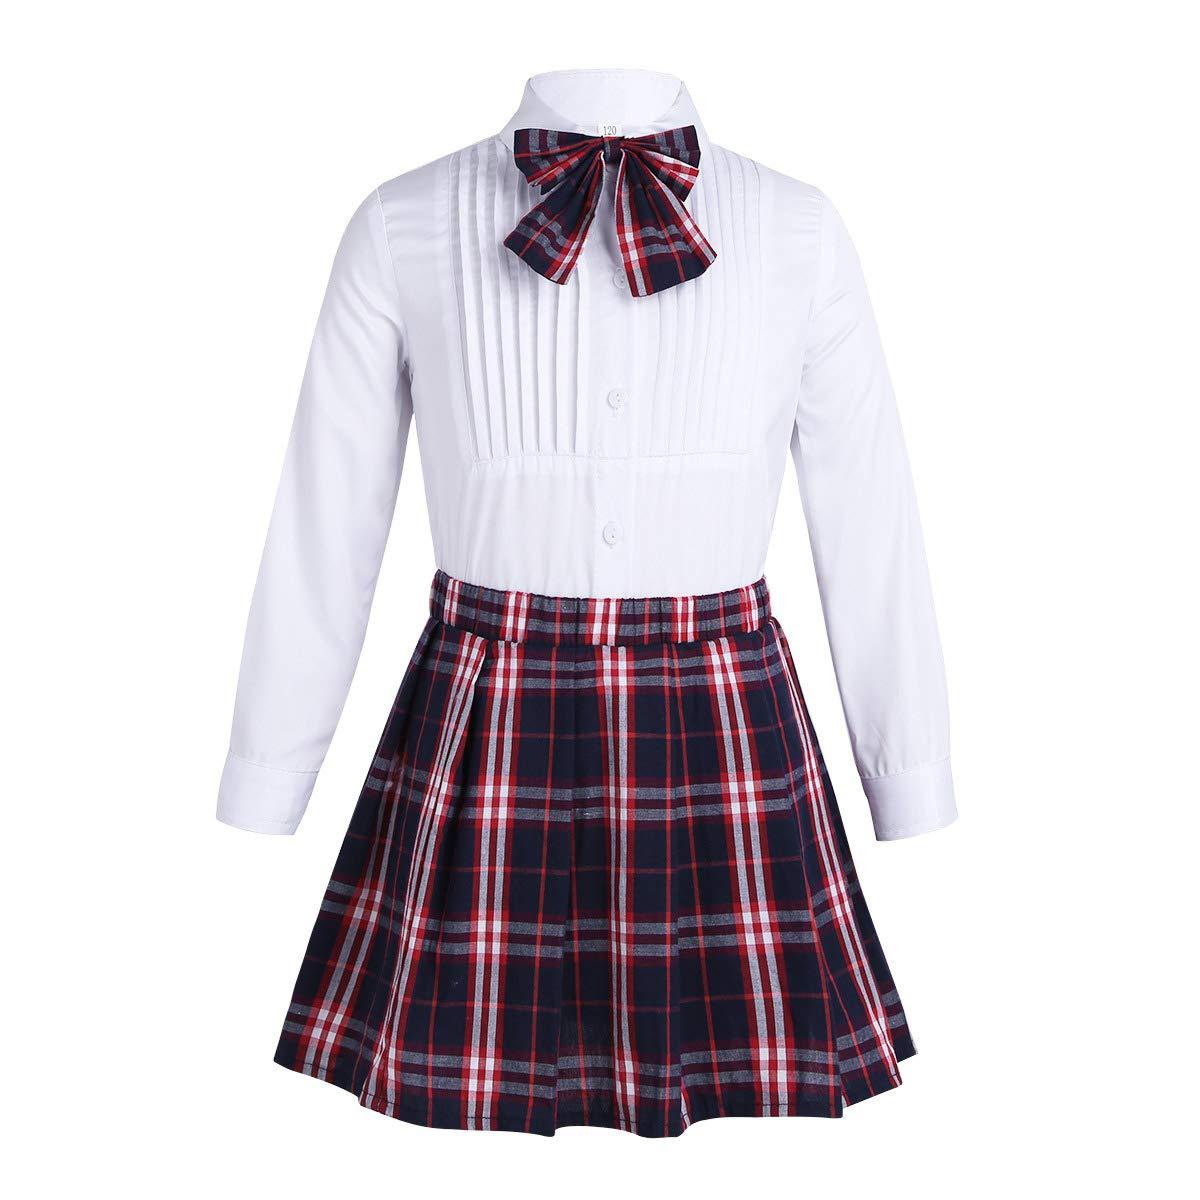 Alvivi Kids Classic School Girls Sailor Shirts Plaid Mini Skirt Uniform Long Sleeve Two-Fer Dress